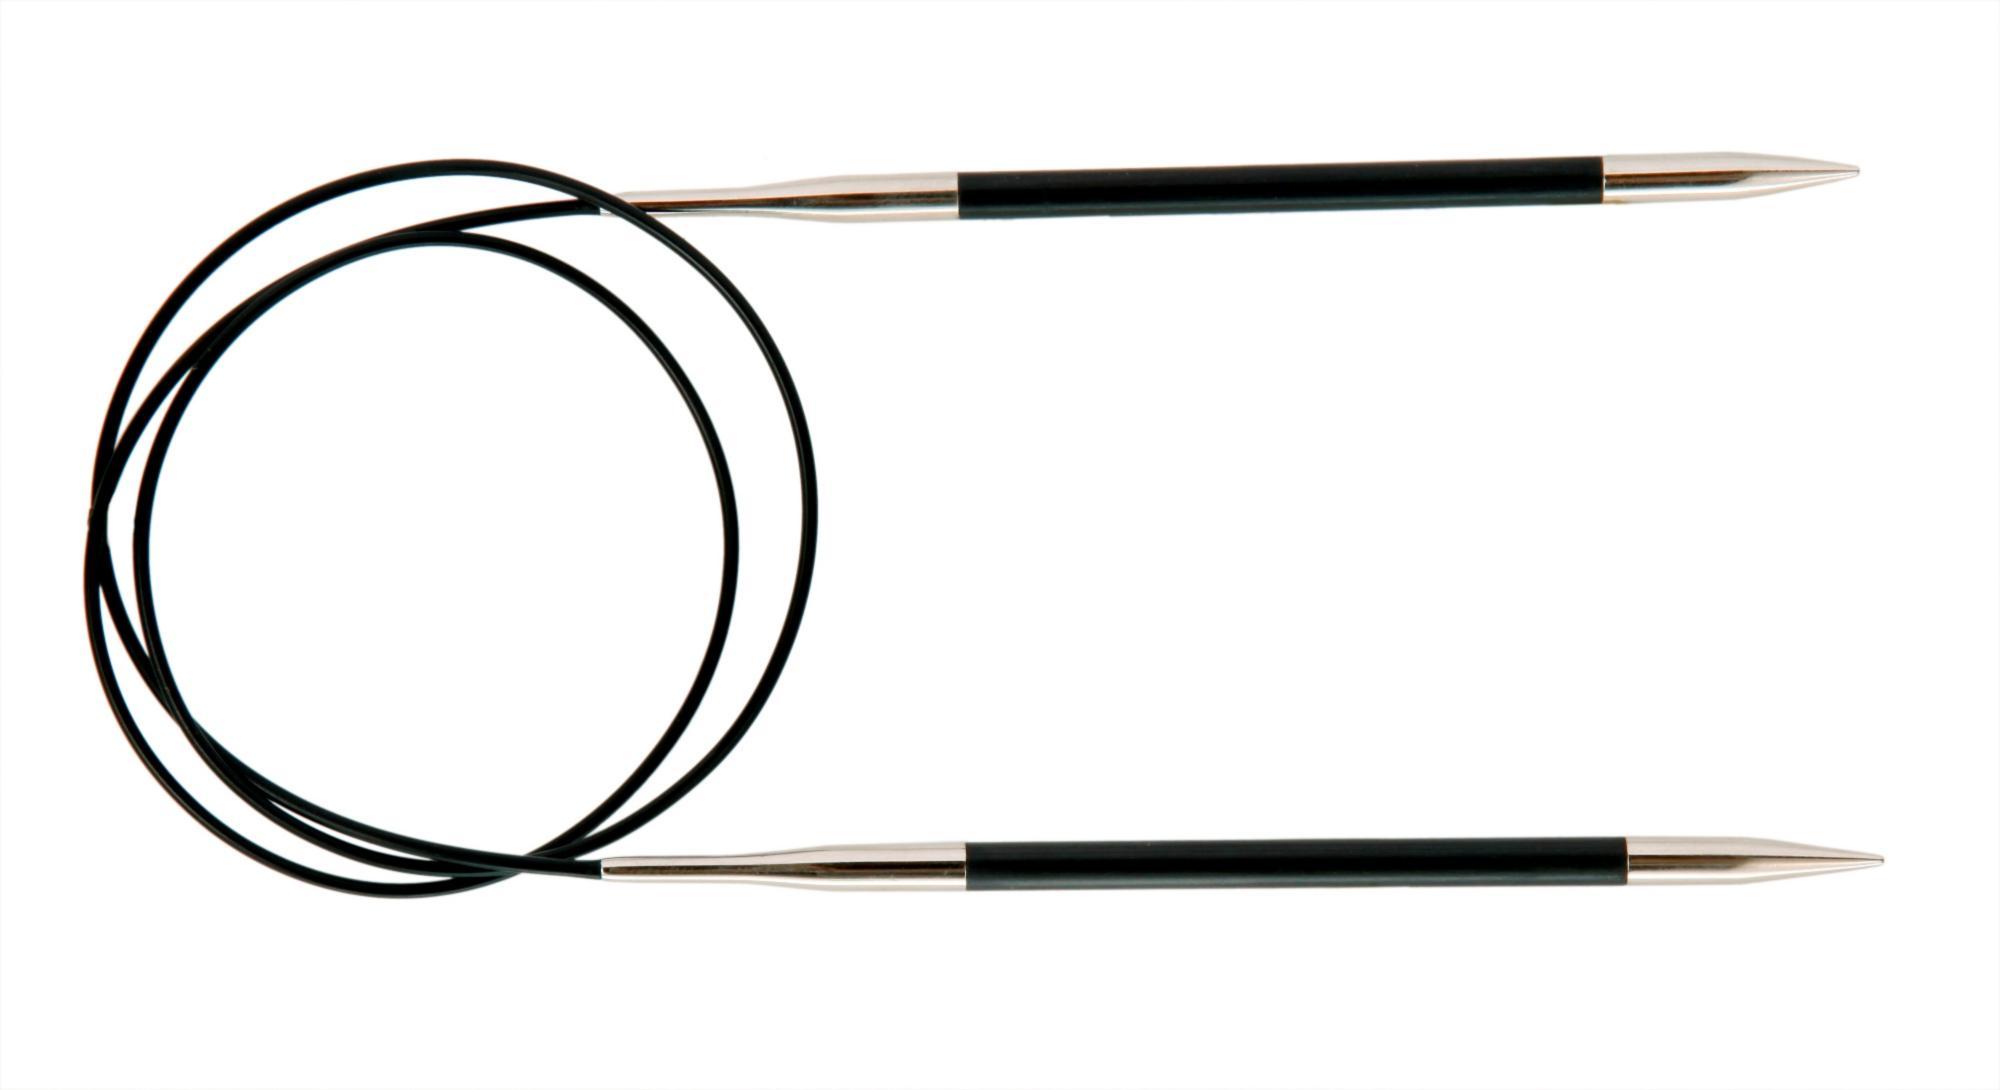 Спицы круговые 100 см Karbonz KnitPro, 41202, 2.25 мм